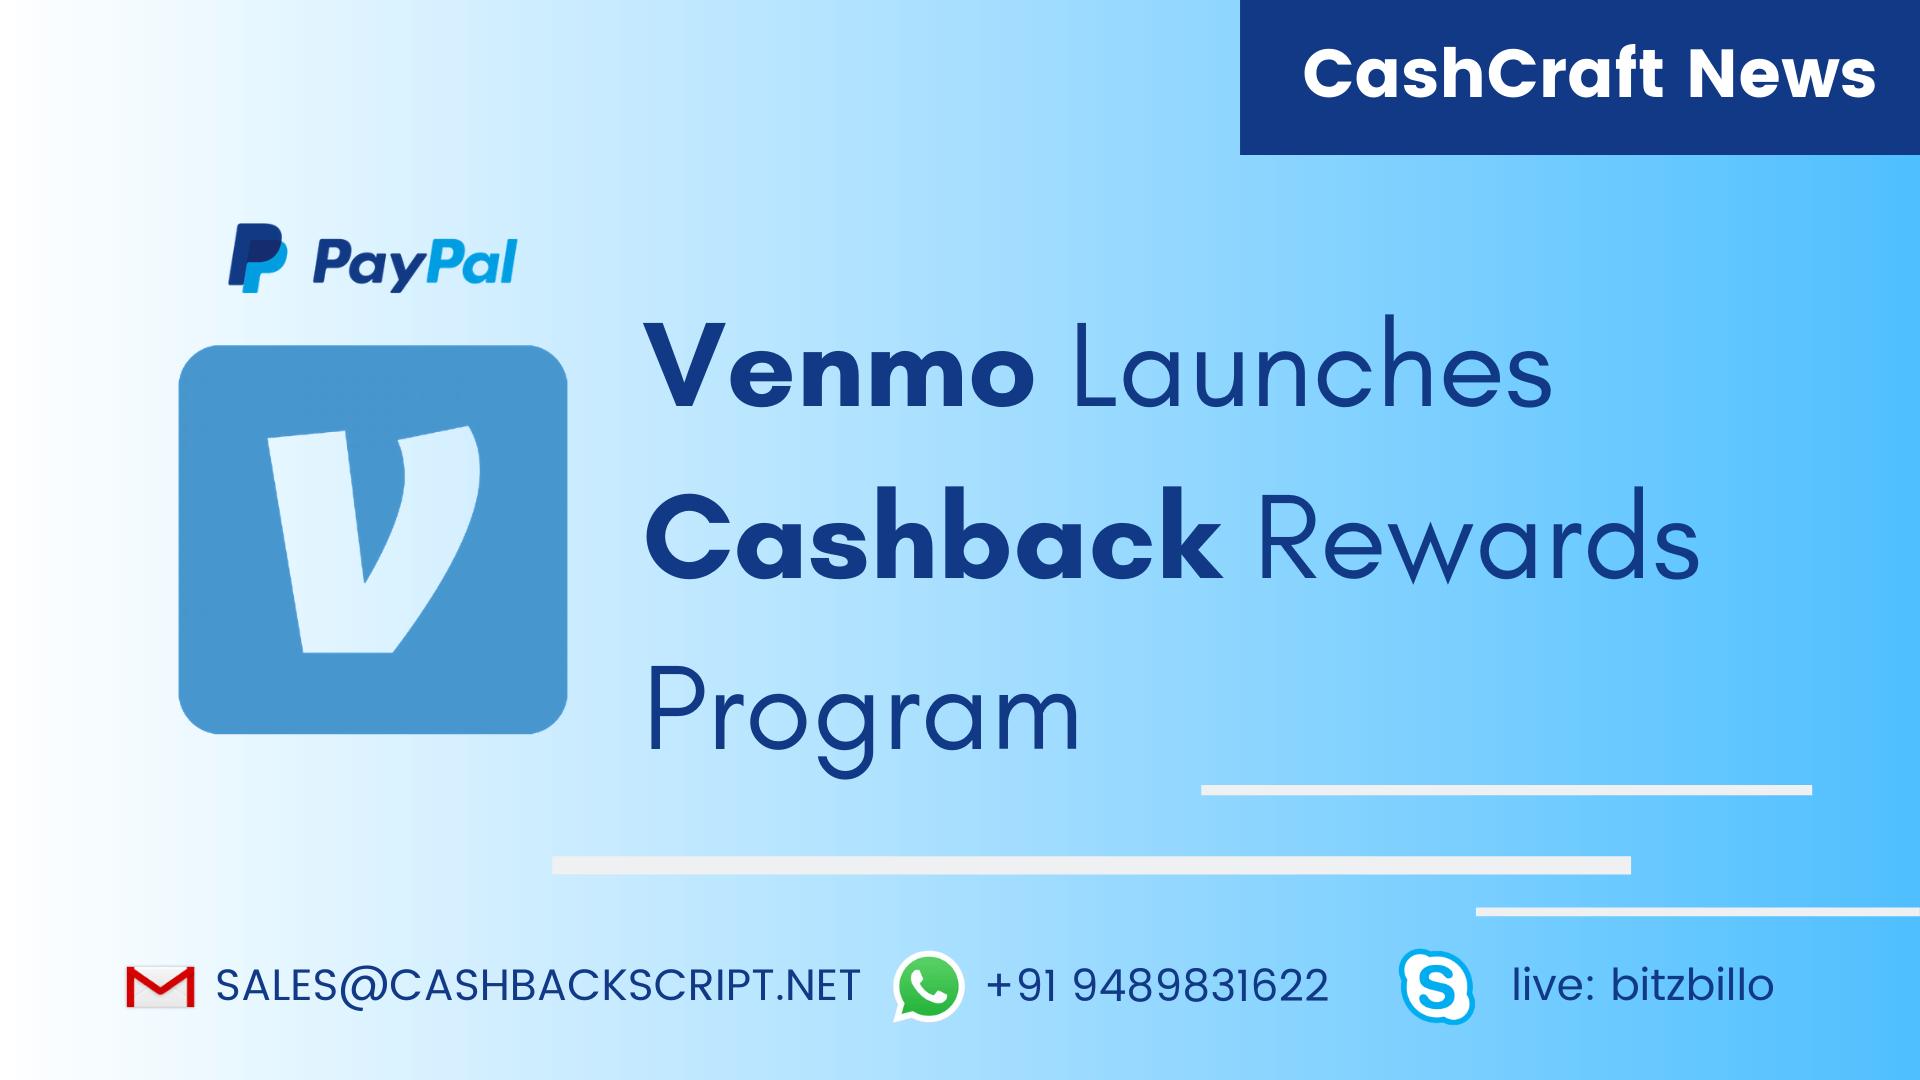 Venmo Launches Cashback Rewards Program